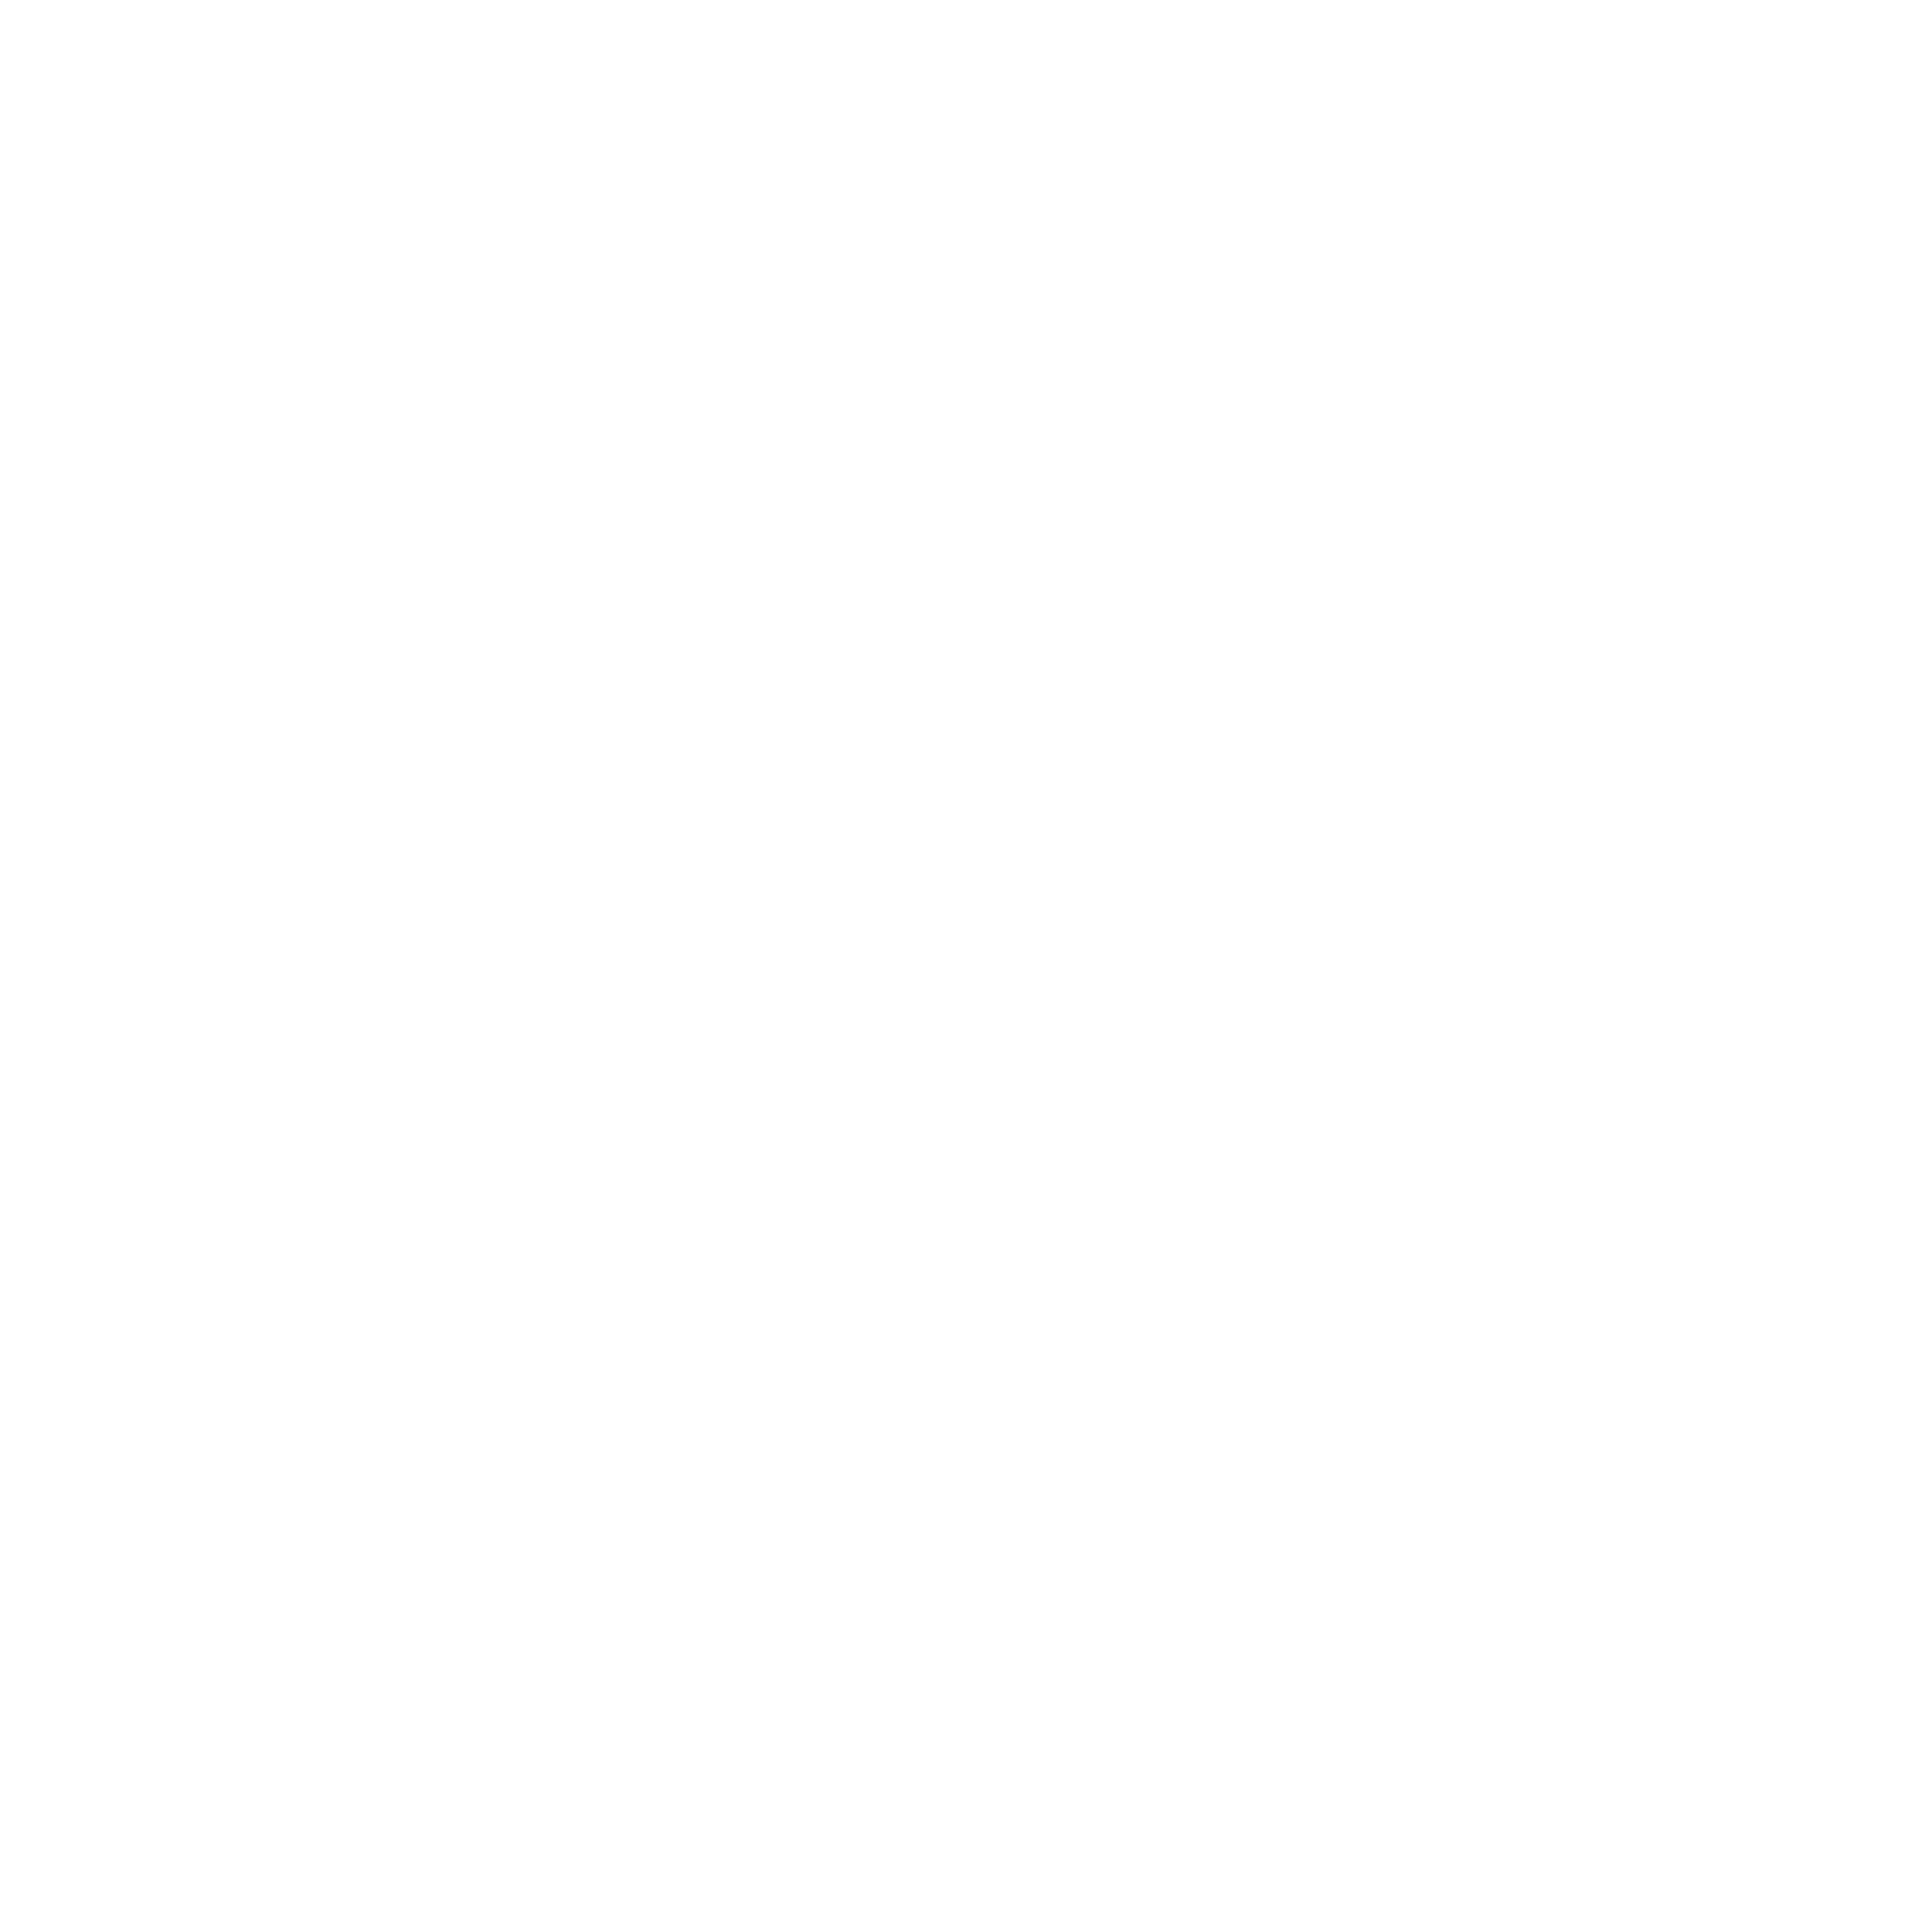 logo-beyond-entrepreneurs